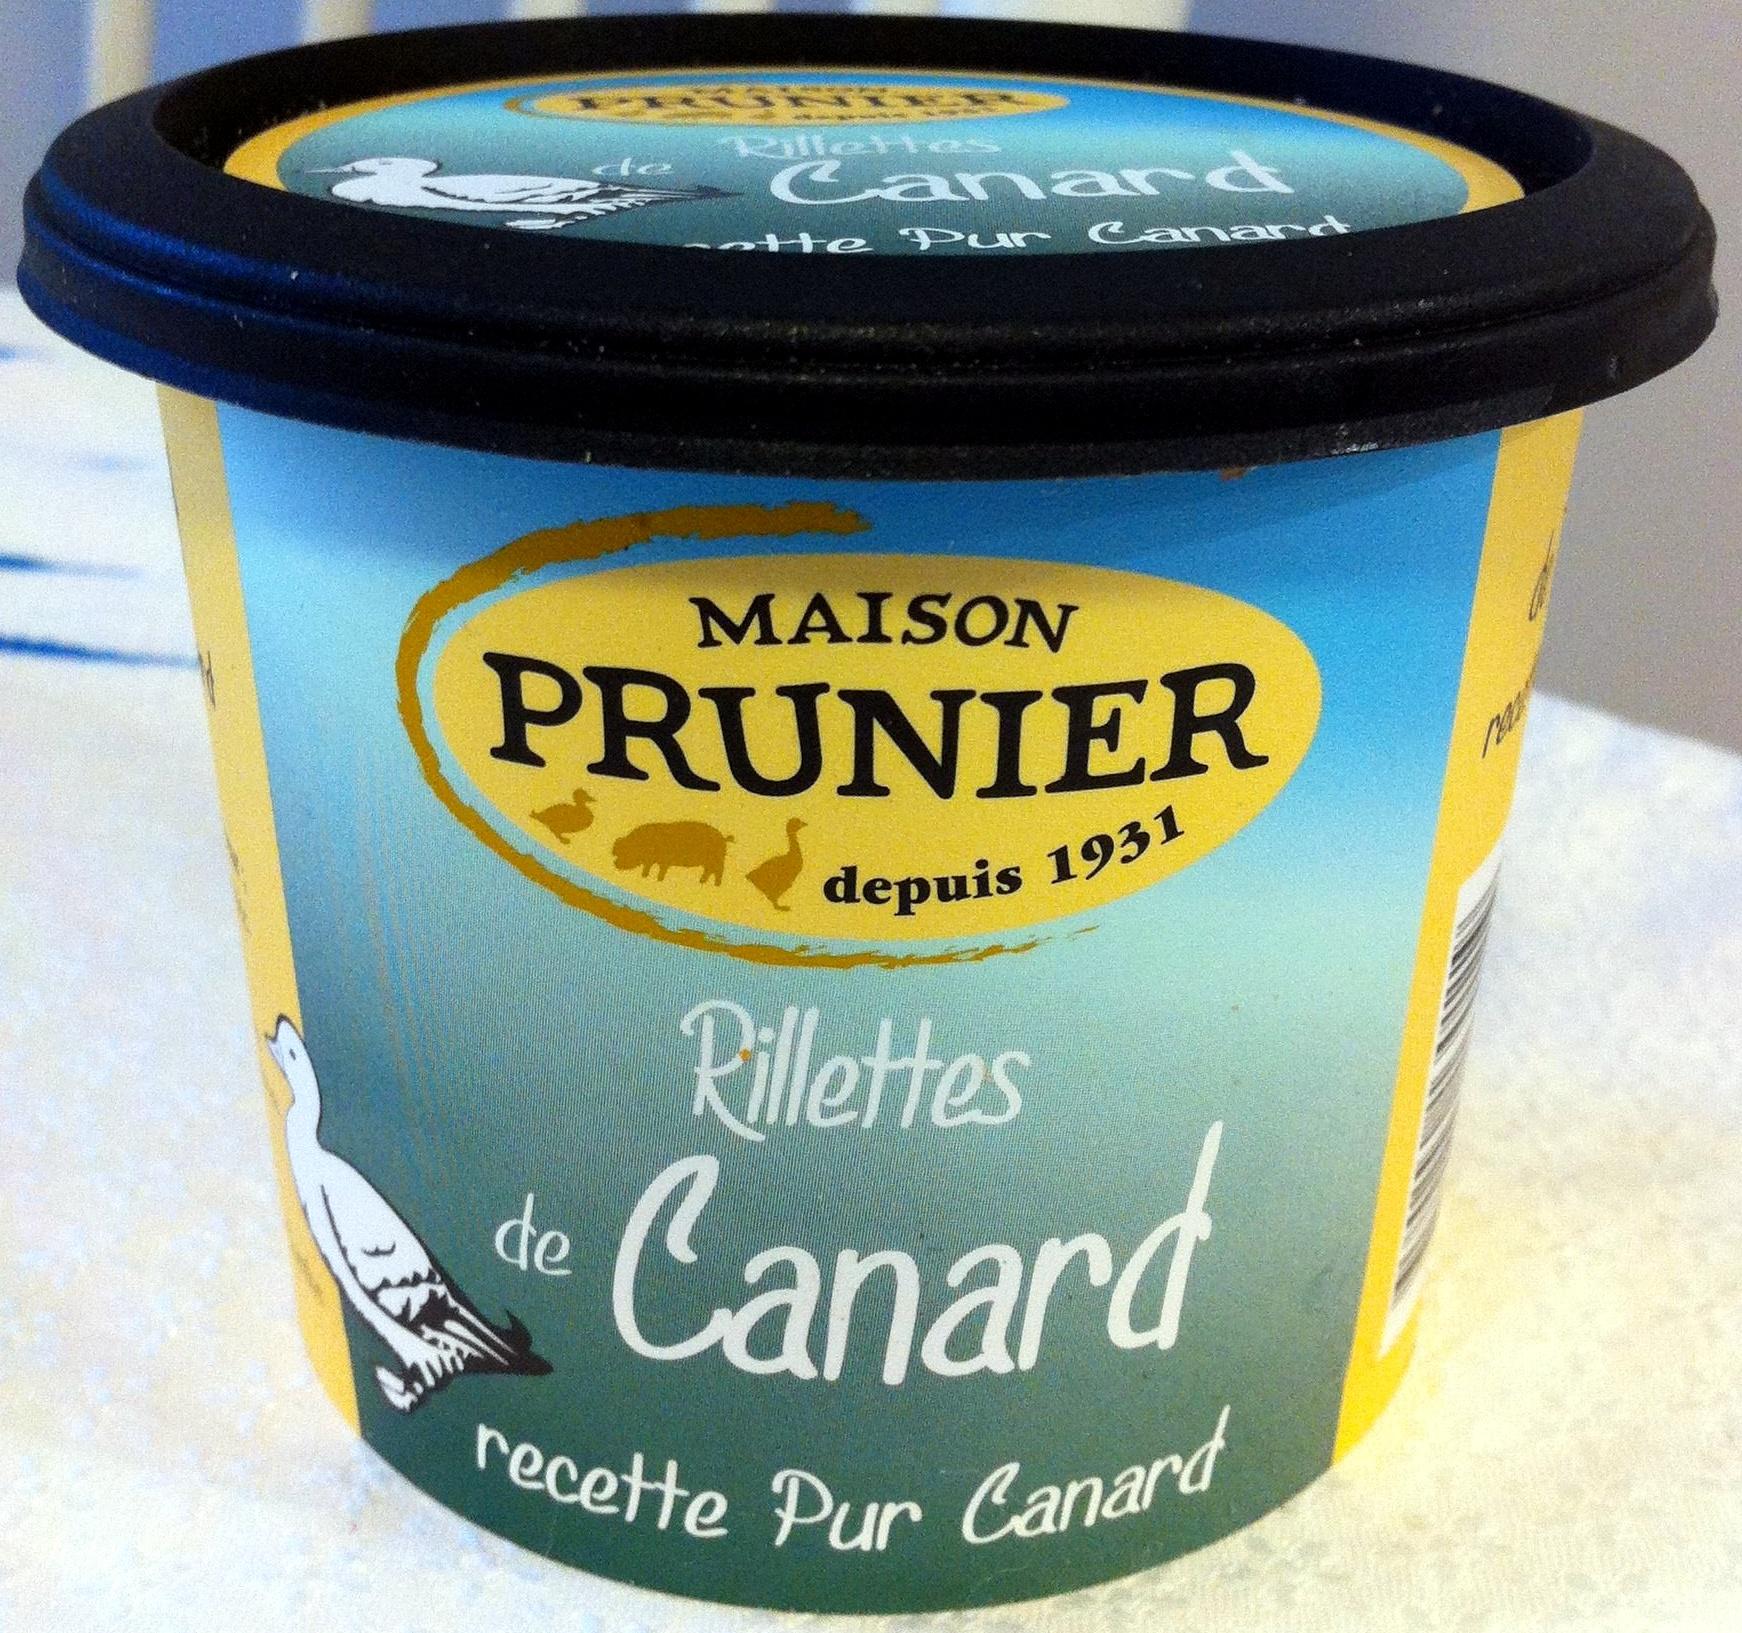 Rillettes de Canard - Product